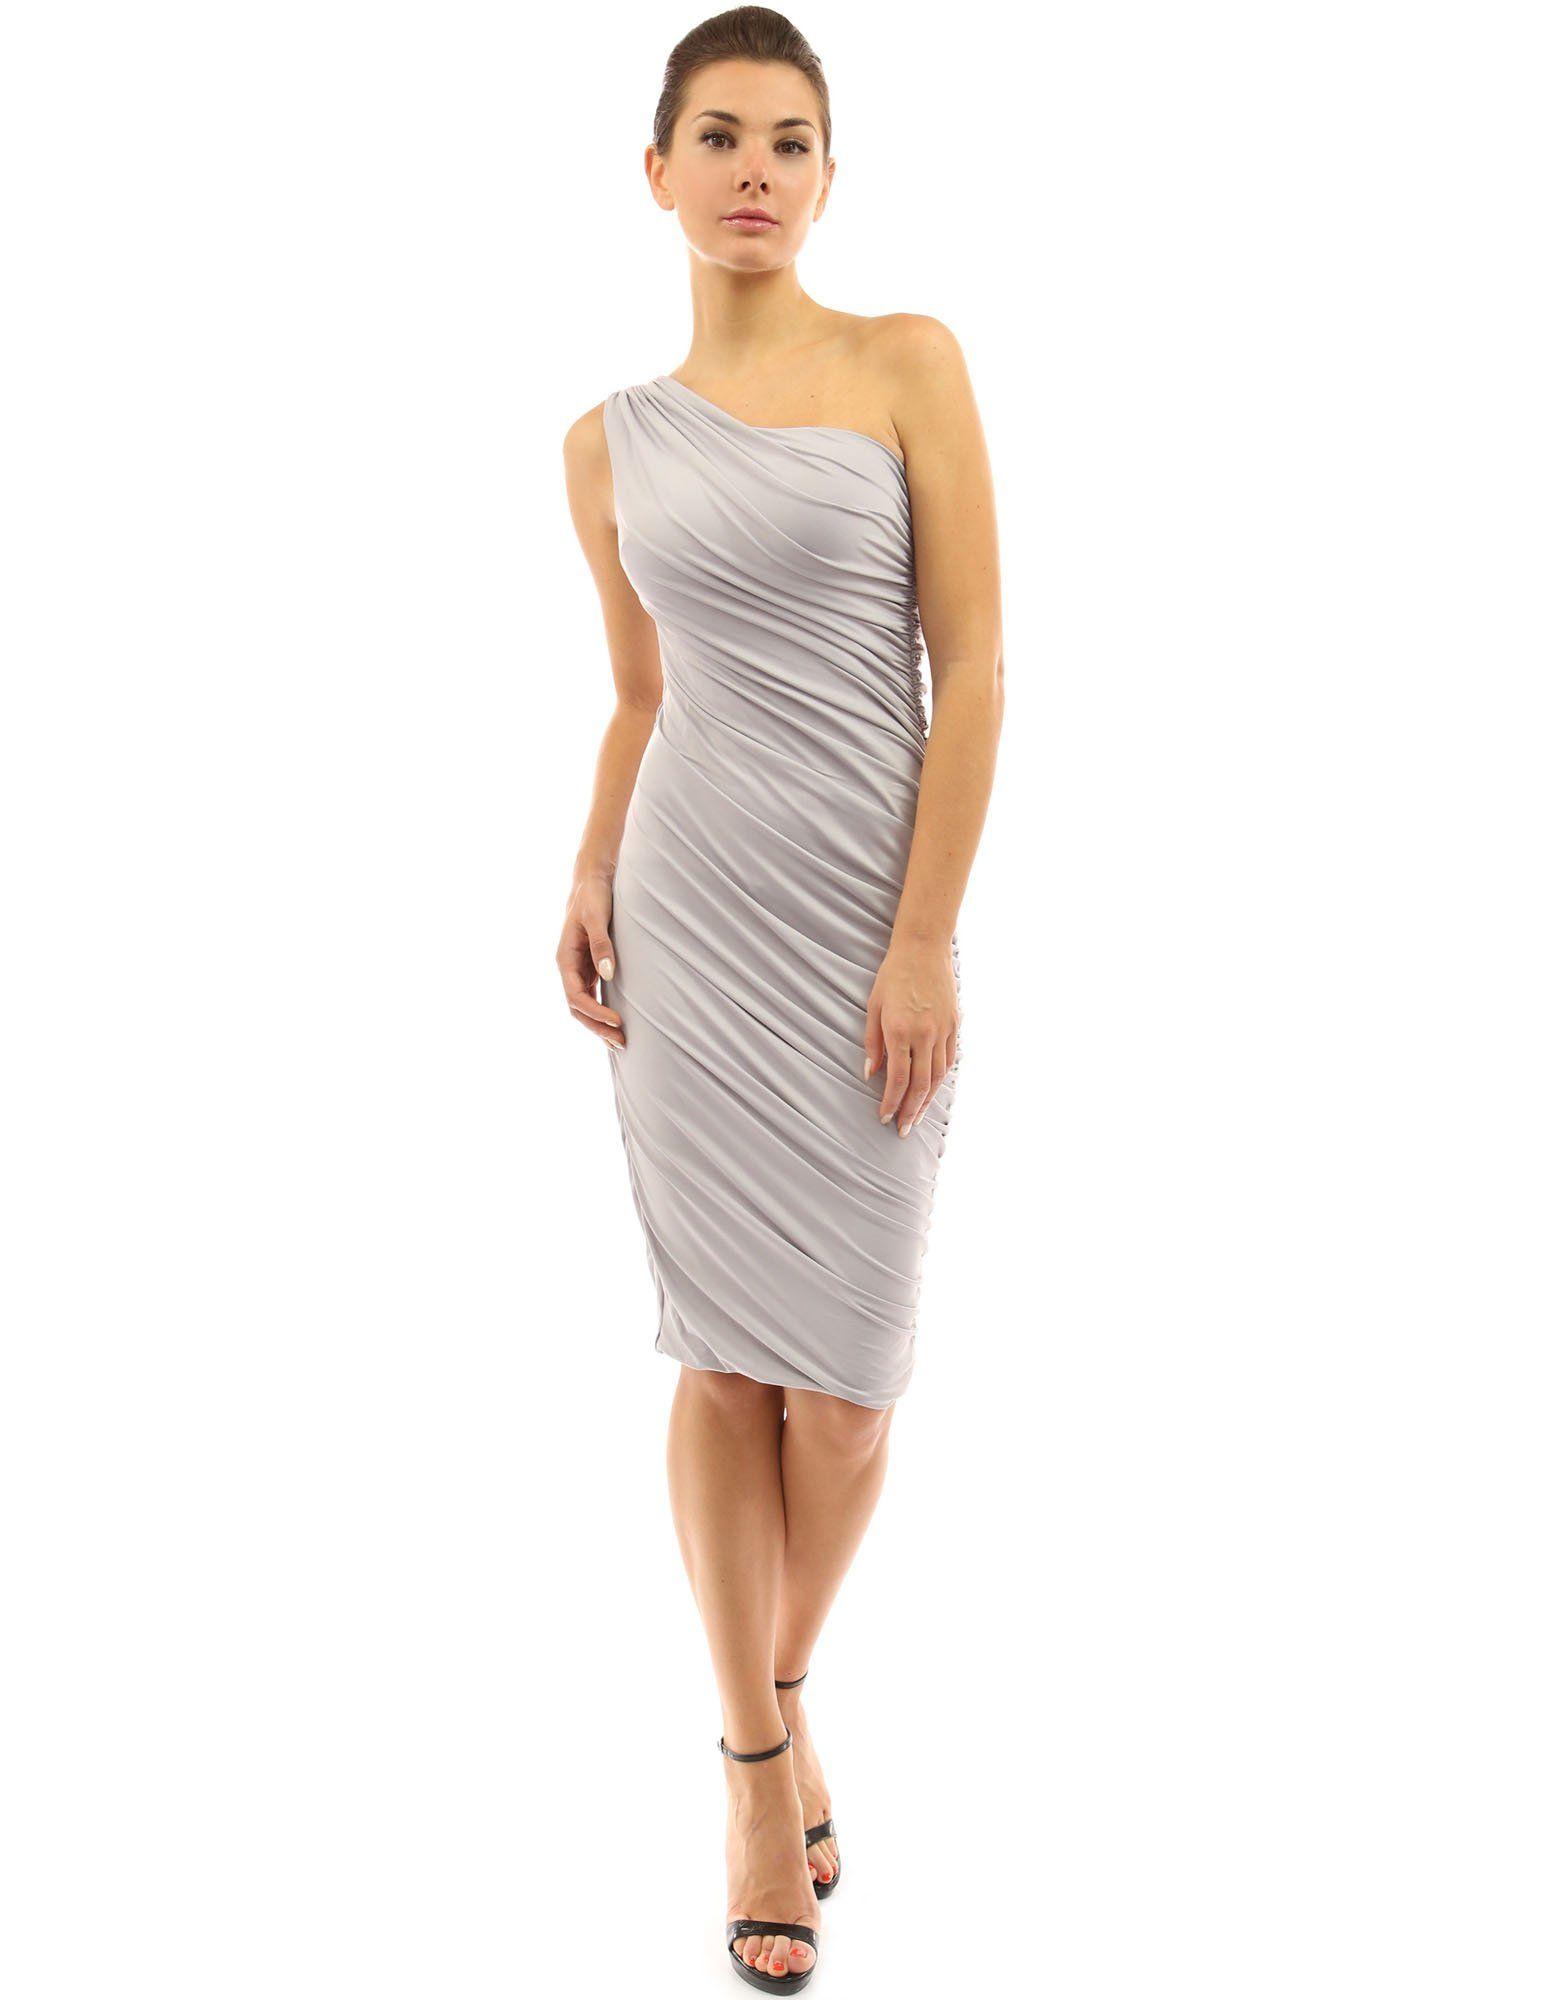 eb16a696cf2 Amazon Womens Cocktail Dresses – DACC